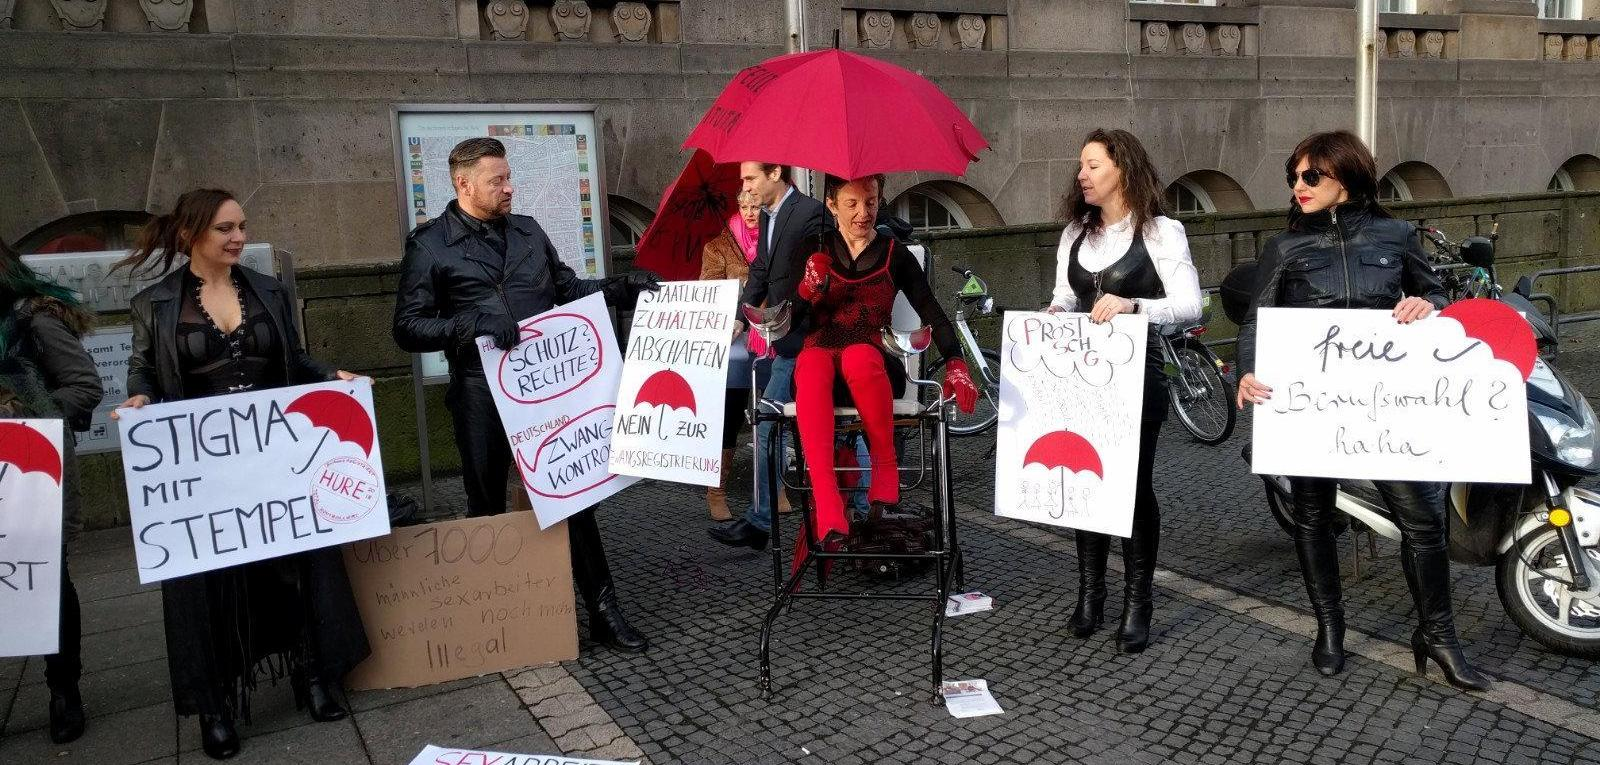 Protestaktion gegen Hurenausweis Berliner Prostituierte